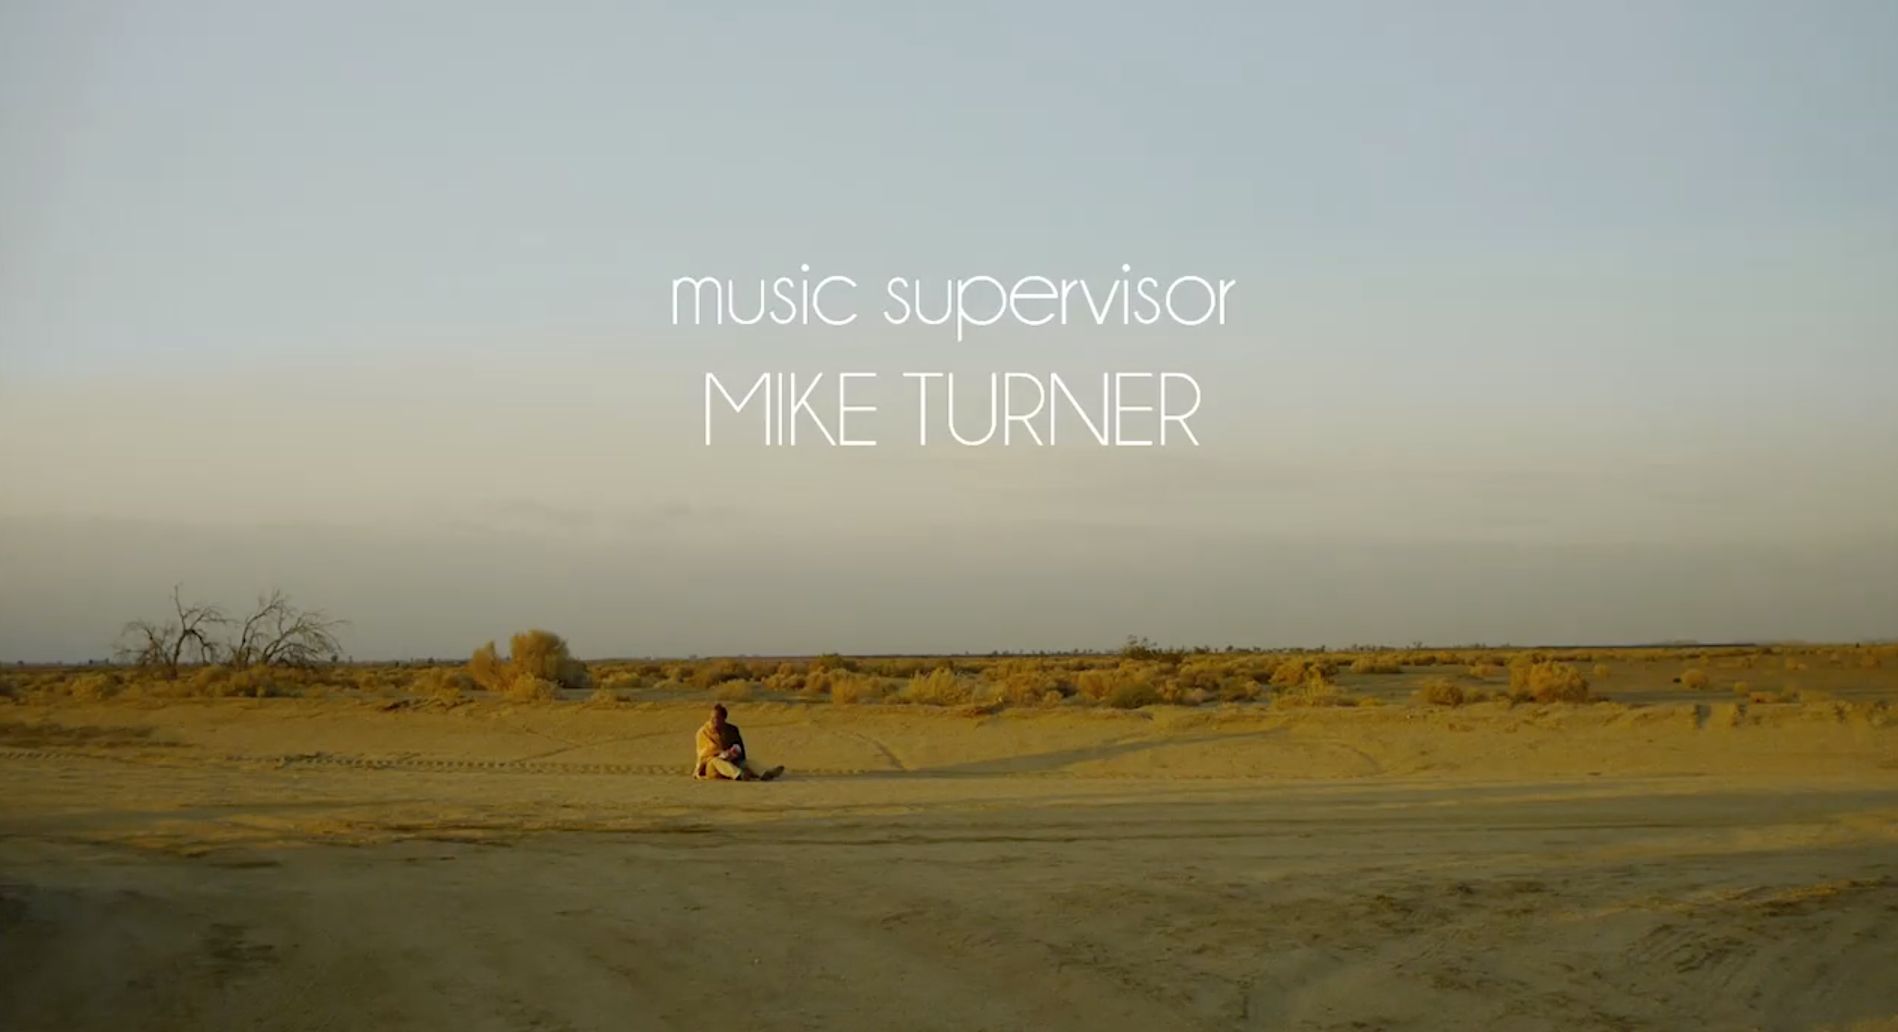 Bio — Mike Turner